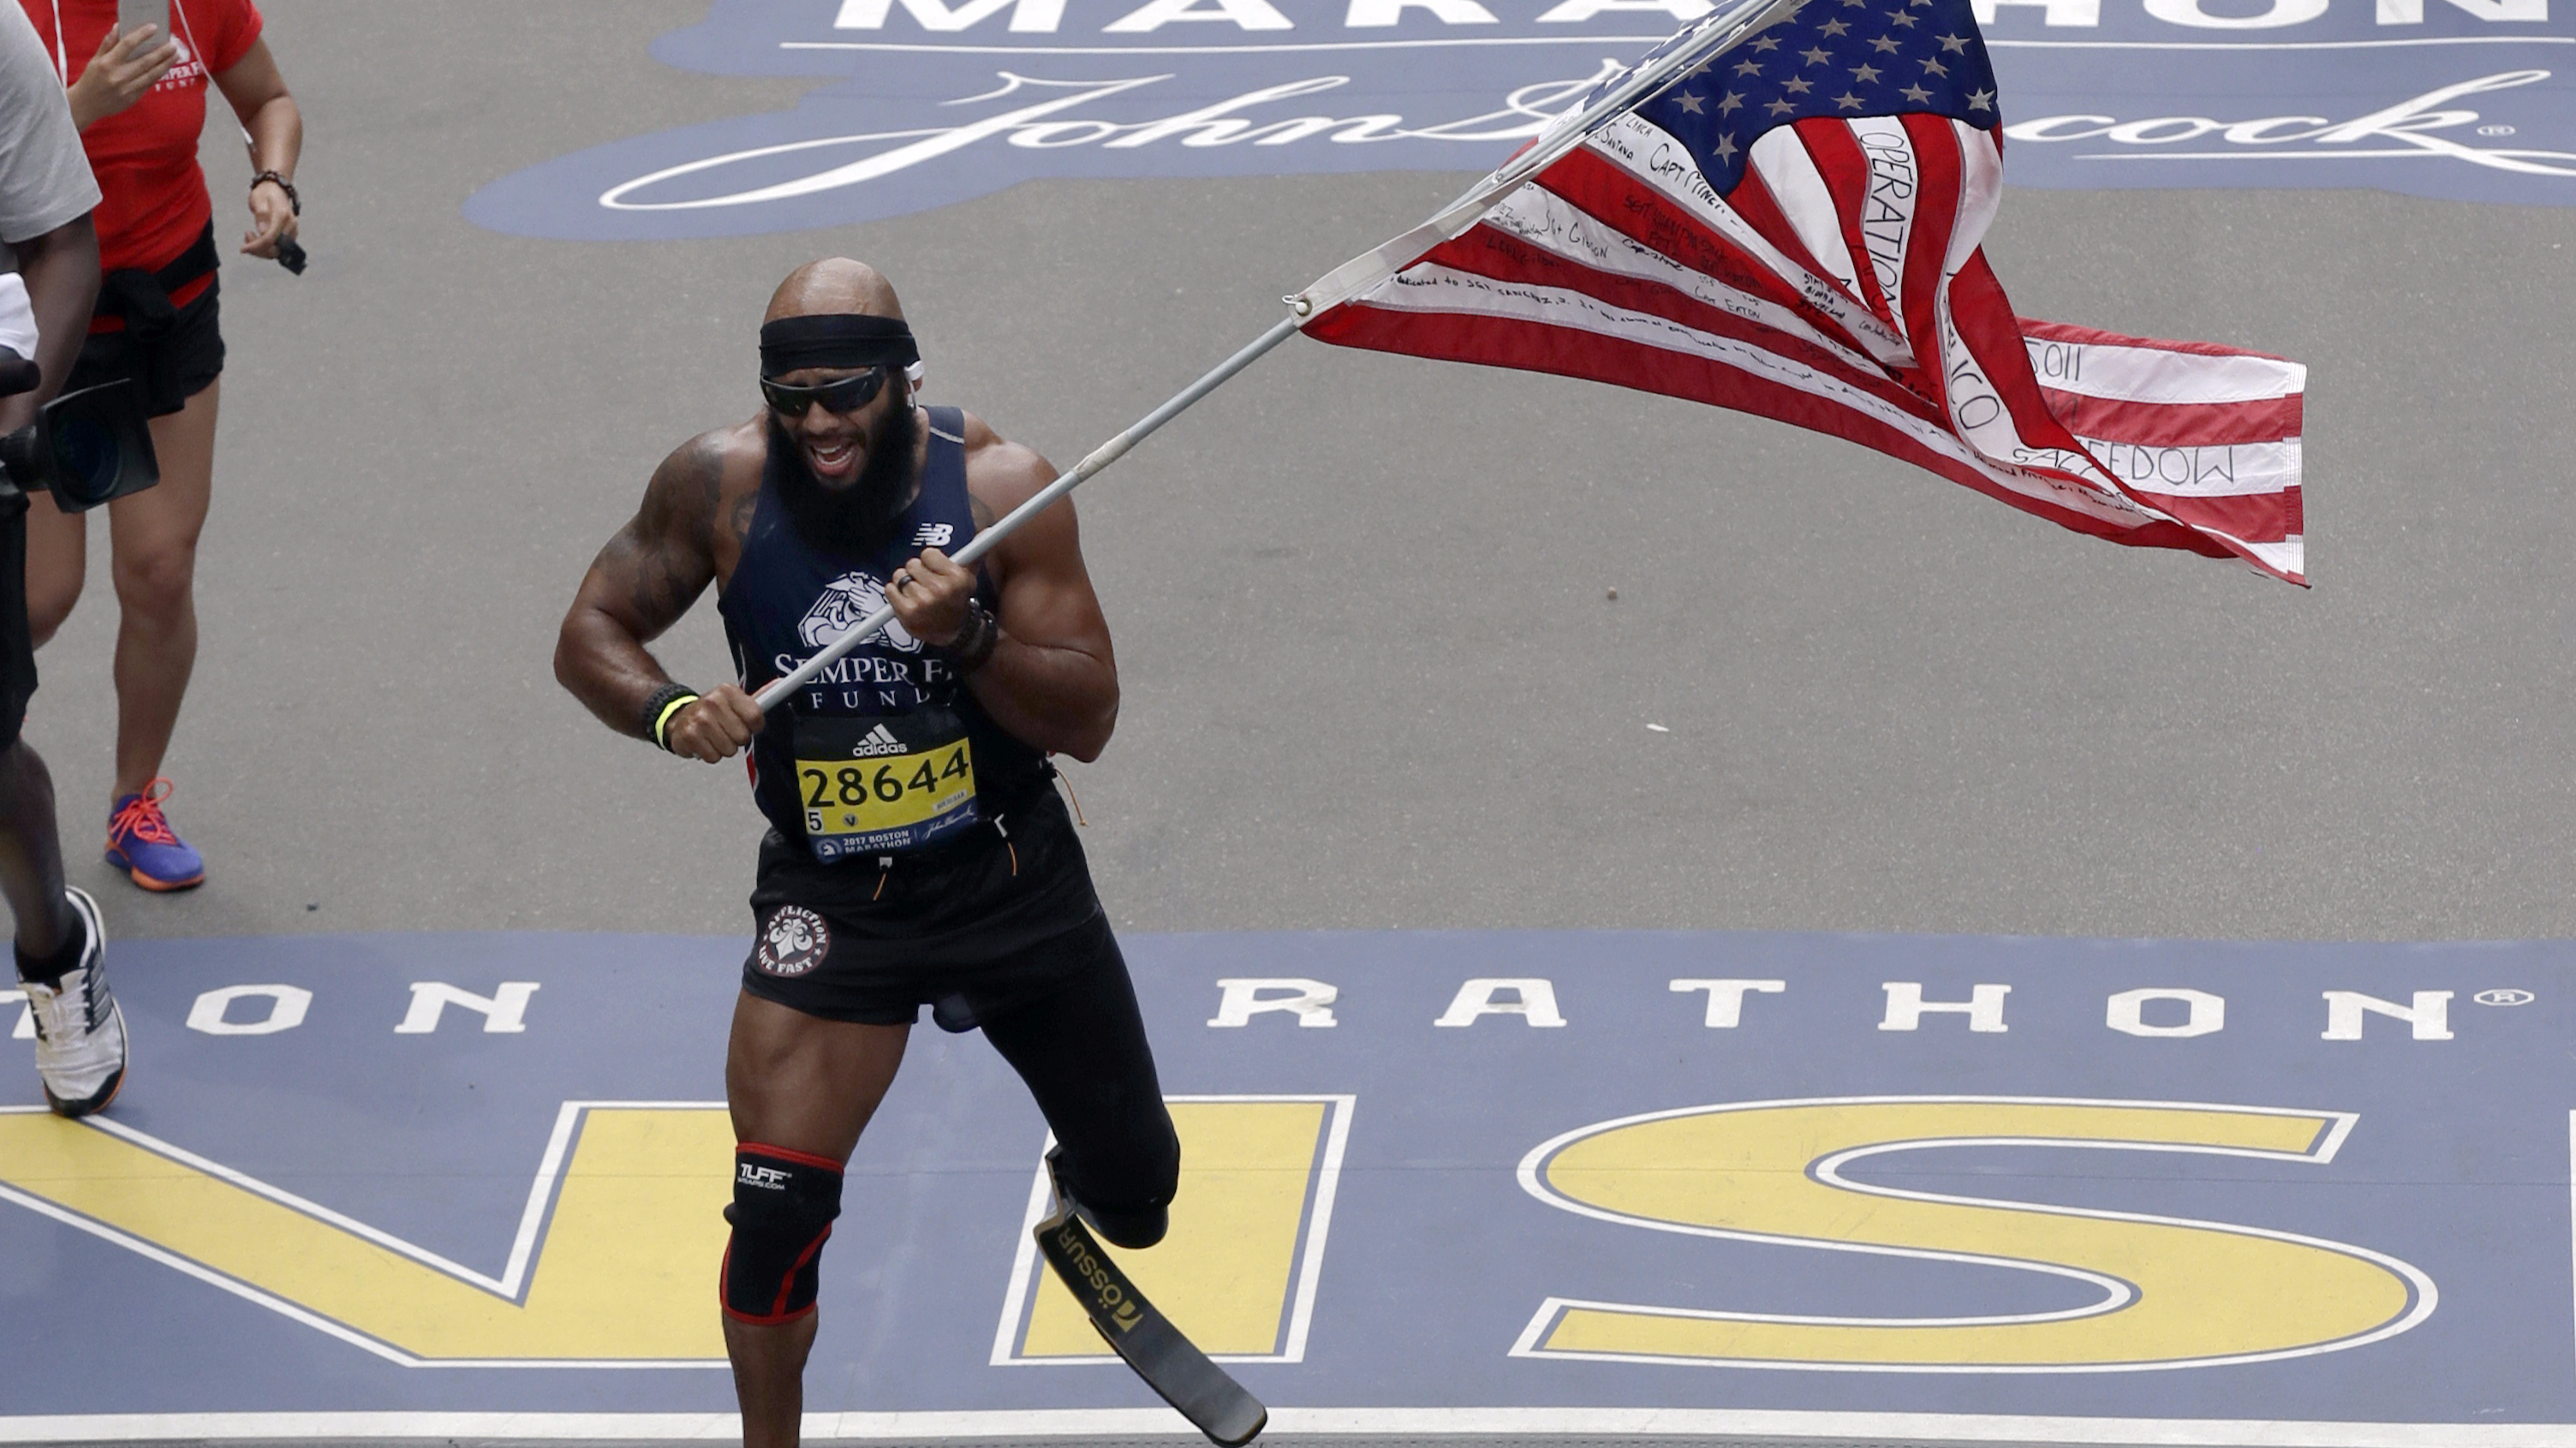 Amputee Marine Completes The Boston Marathon With Massive American Flag